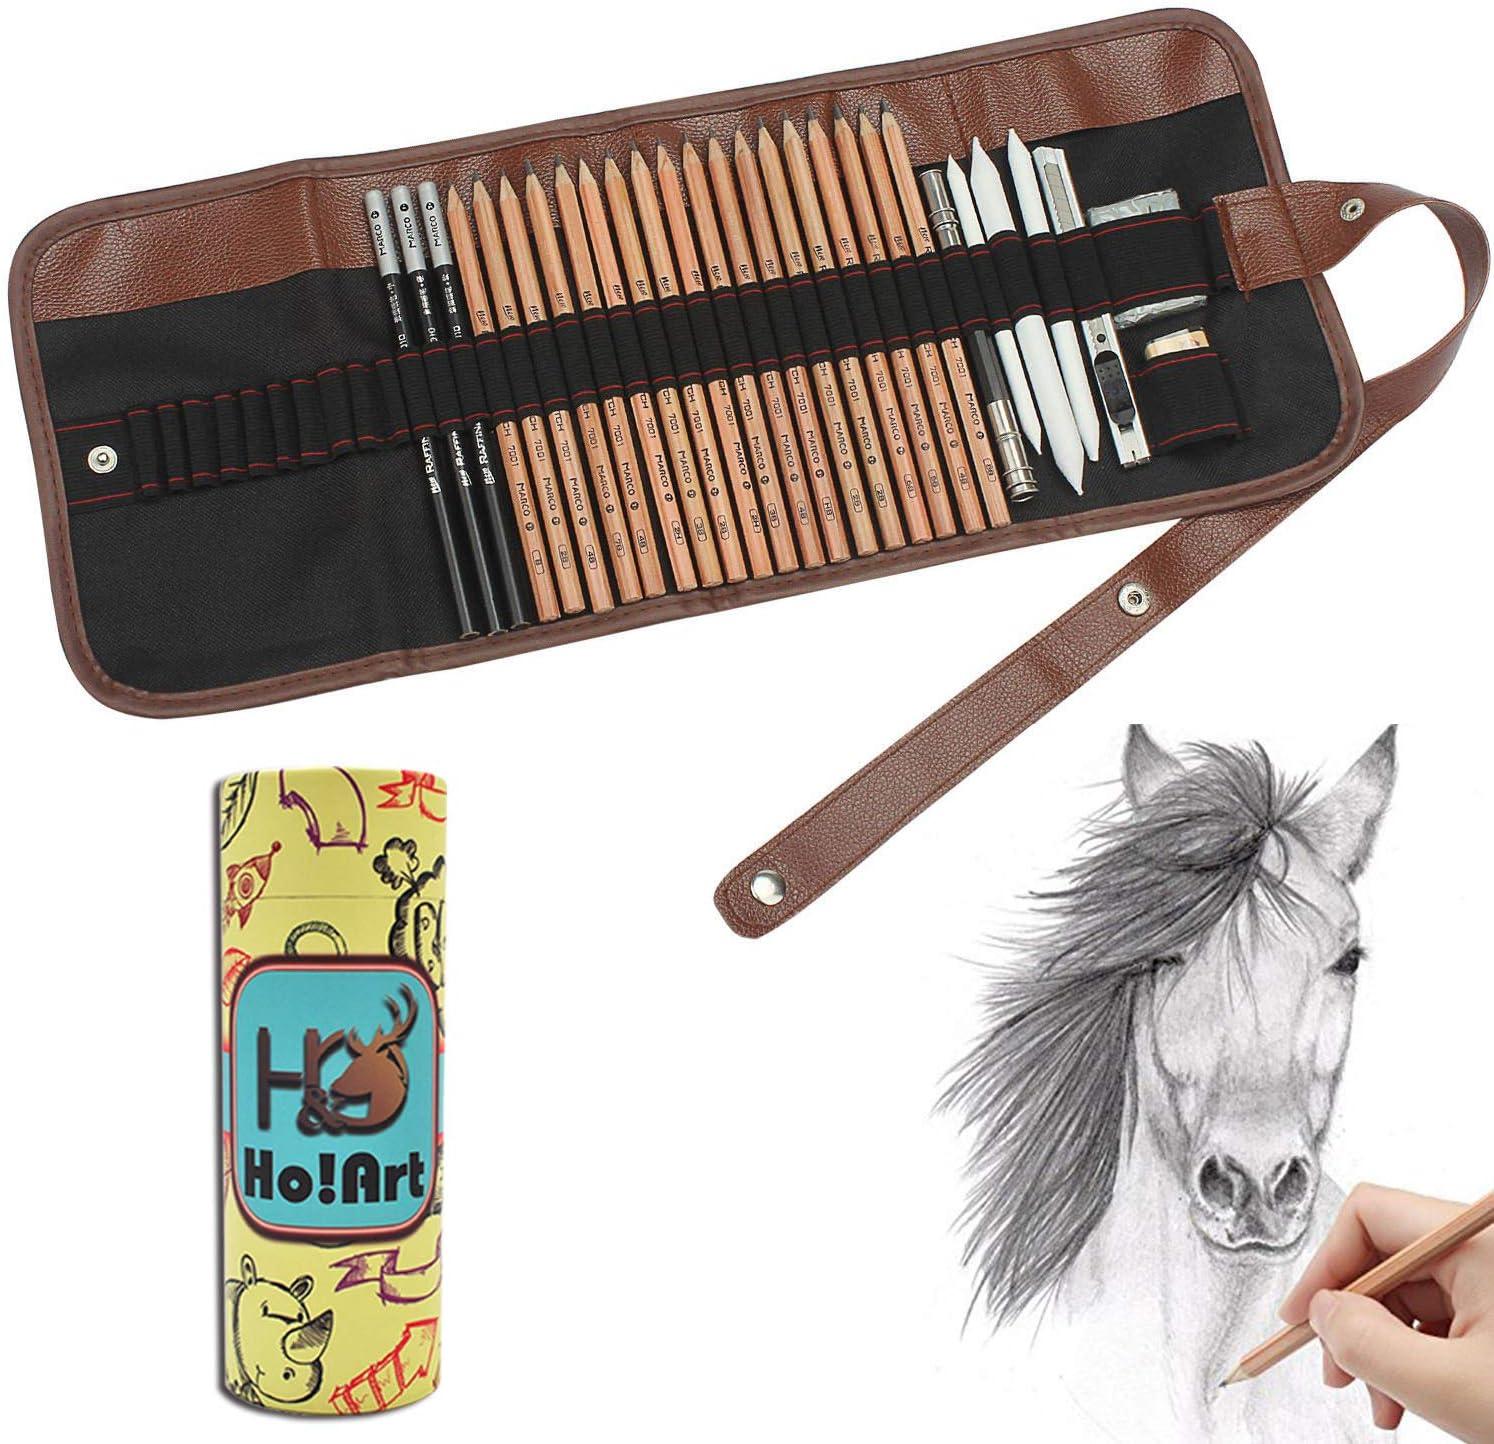 Sketching Pencil Set, Ho! Art 30pcs Sketch Drawing Kit, Graphite Pencils, Charcoal Pencils, Paper Erasable Pen, Erasers, Craft Canvas Bag Perfect Present for Children Teens Adults Artist Beginners : Arts, Crafts & Sewing